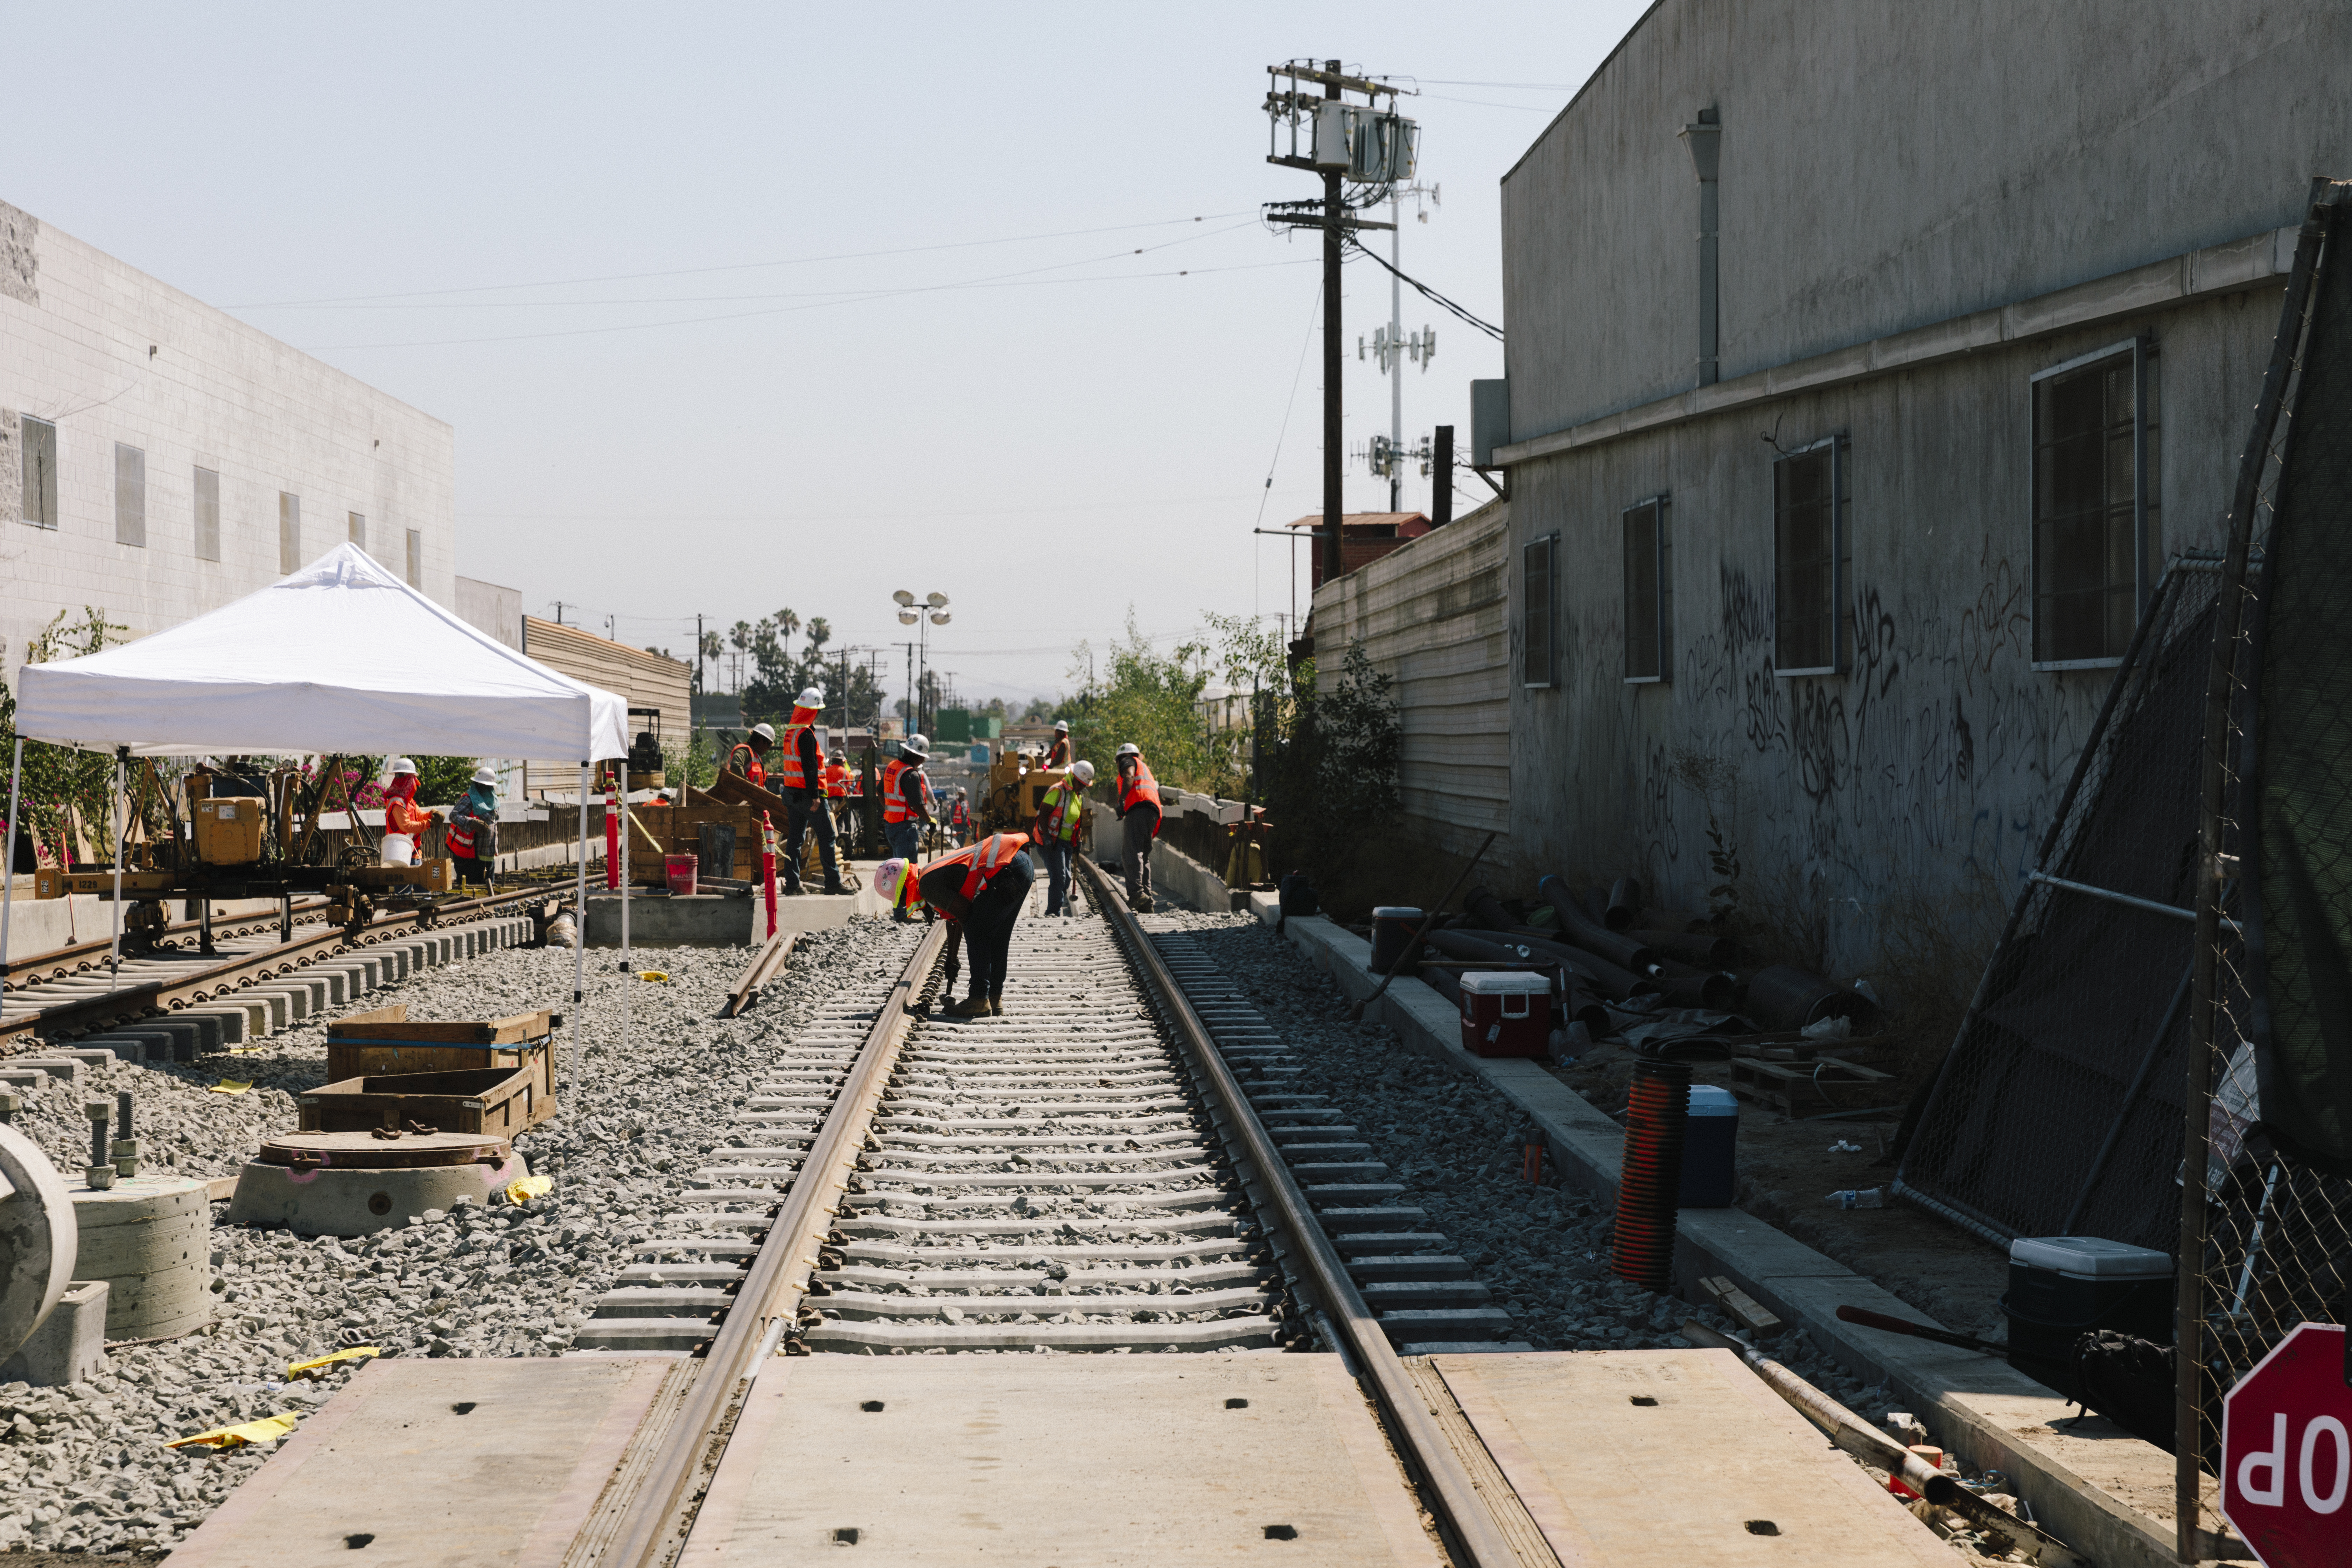 Metro's Crenshaw/LAX Line opening delayed to 2020